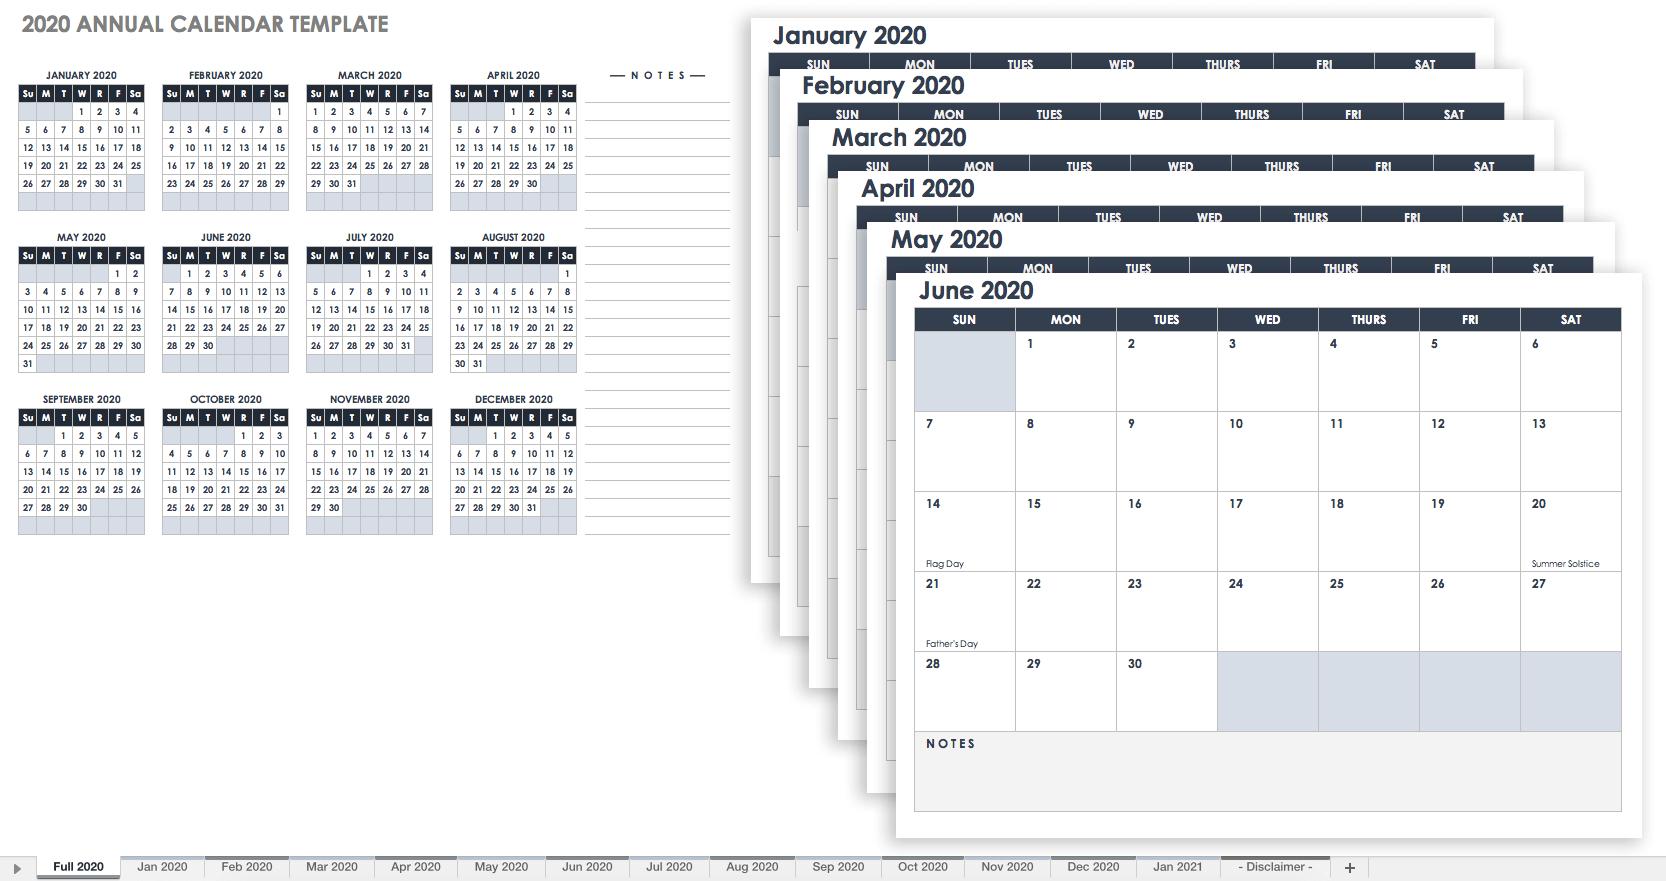 Free, Printable Excel Calendar Templates For 2019 & On | Smartsheet throughout 5 School Day Calendar Blank